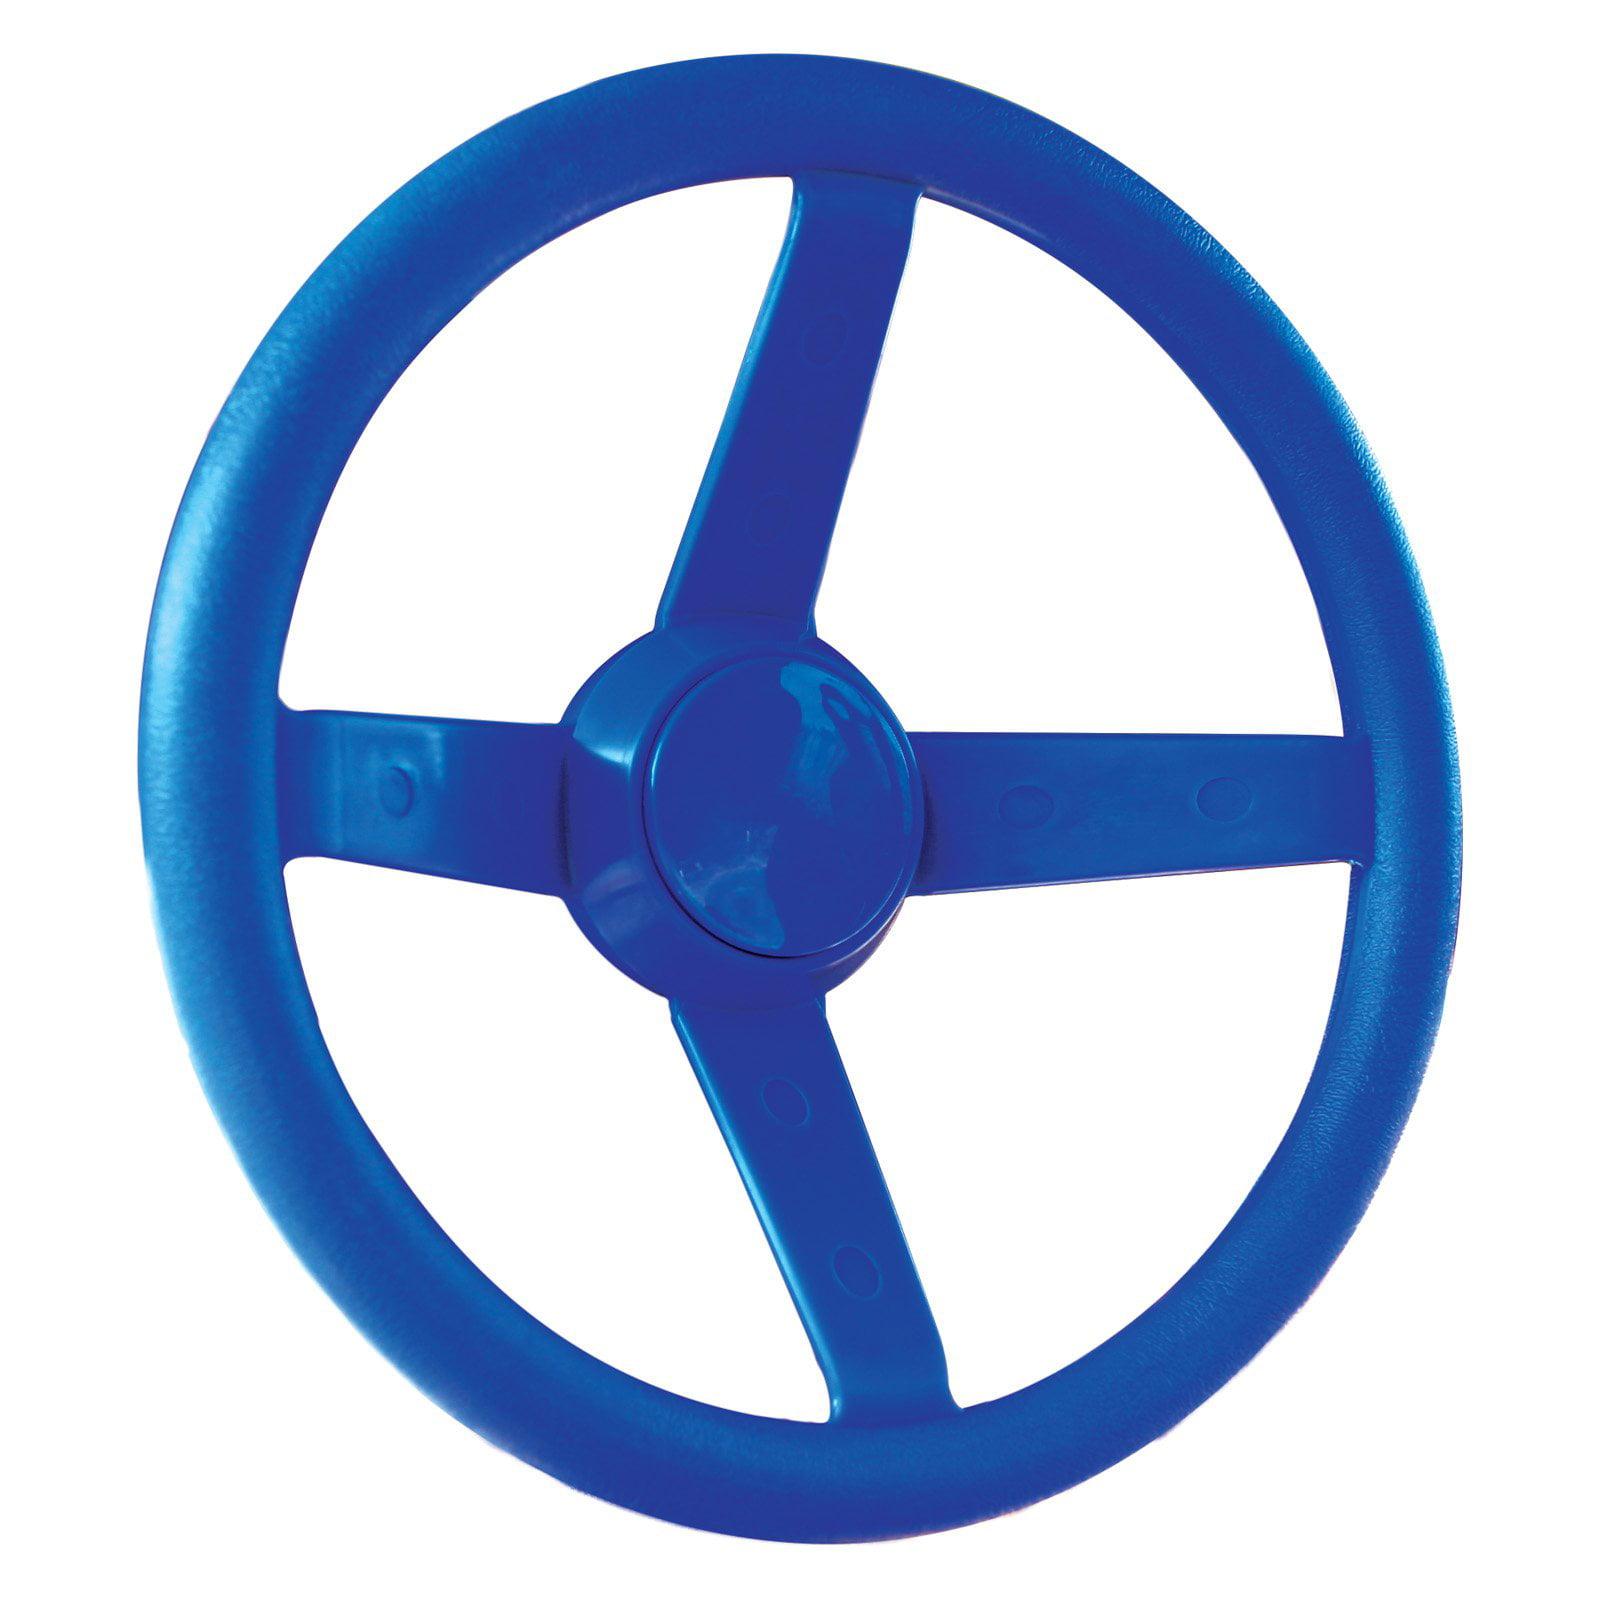 Gorilla Playsets Steering Wheel